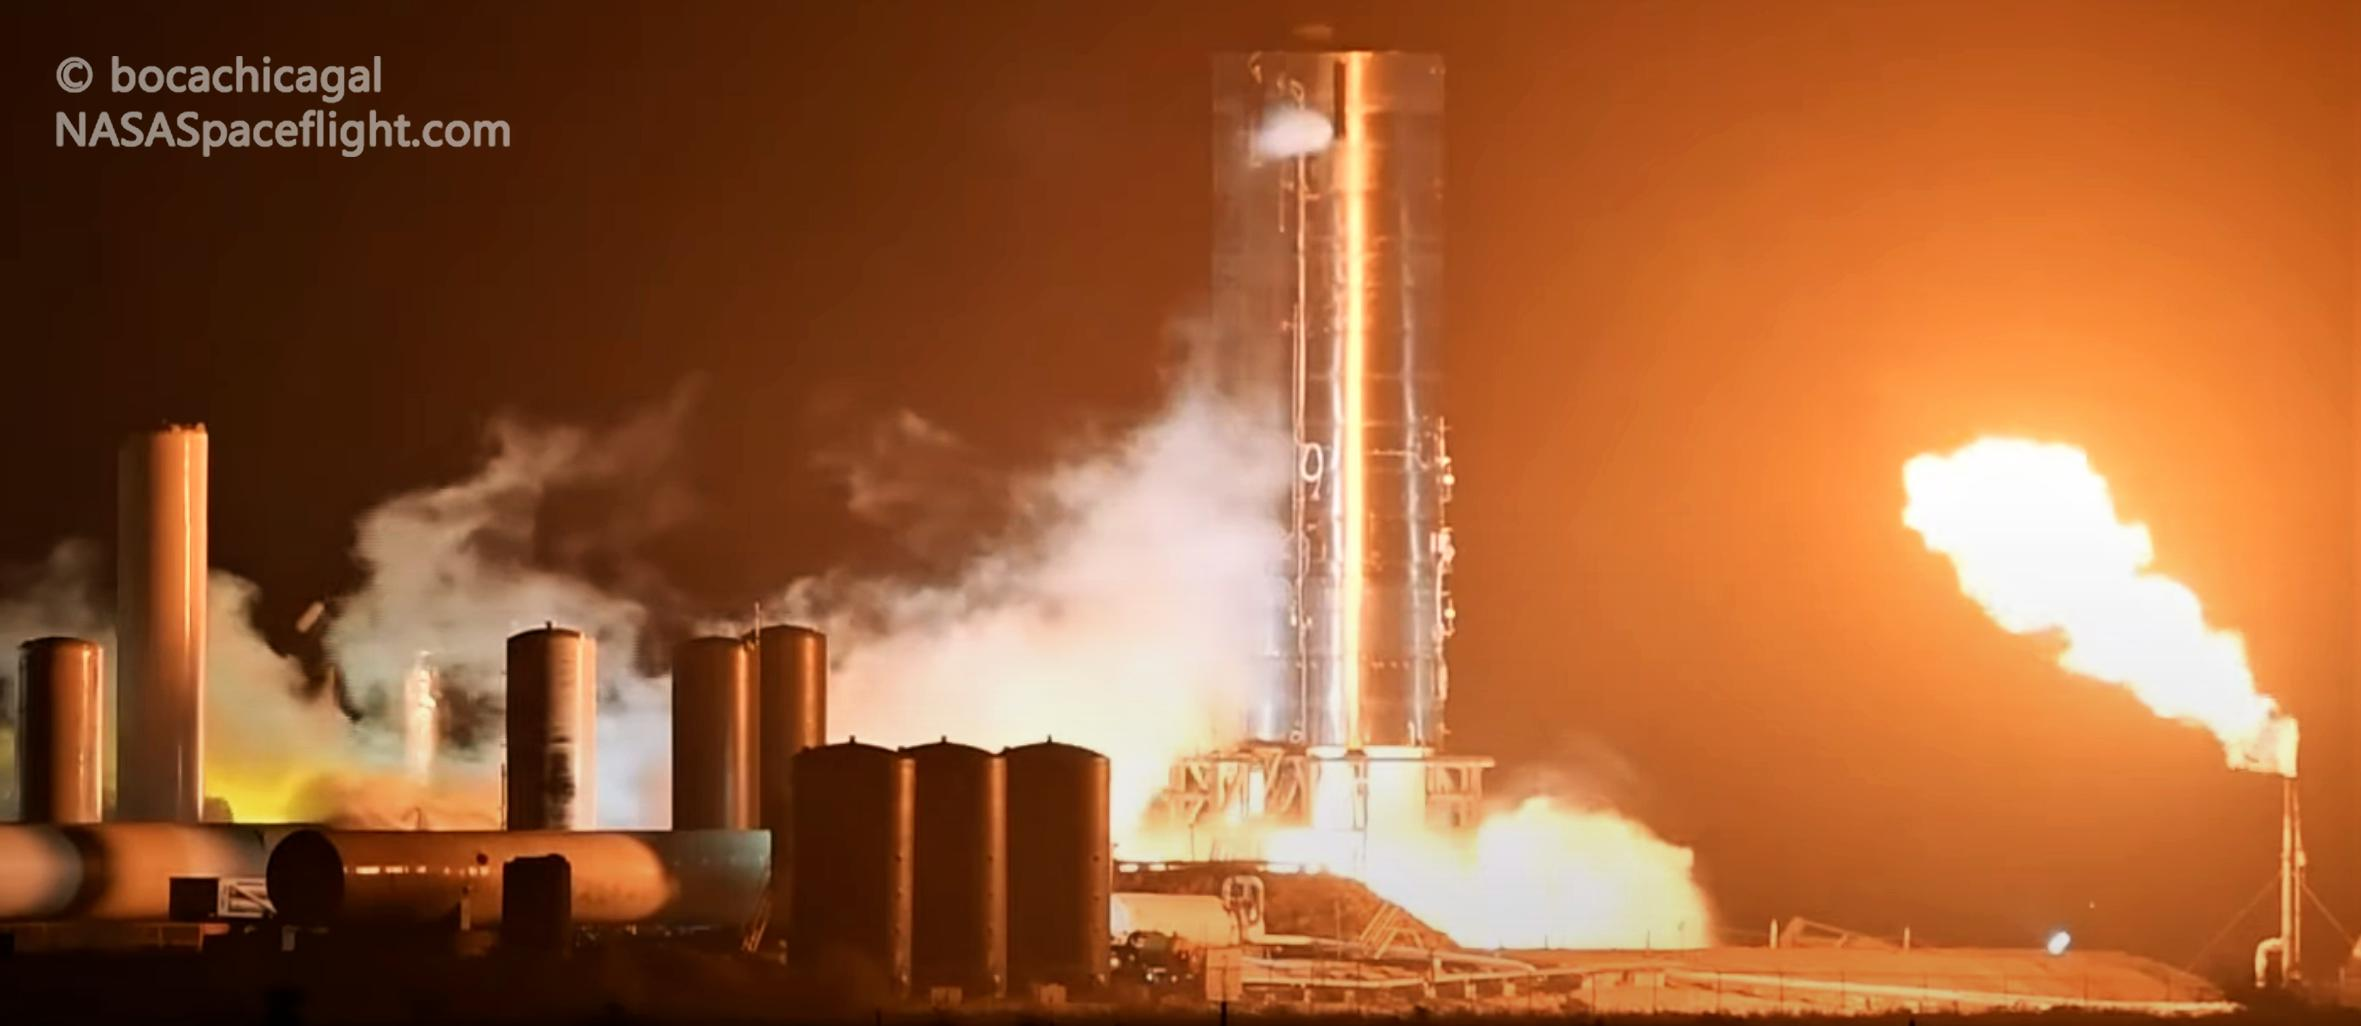 Starship Boca Chica 050420 (NASASpaceflight – bocachicagal) SN4 preburner test 1 crop (c)